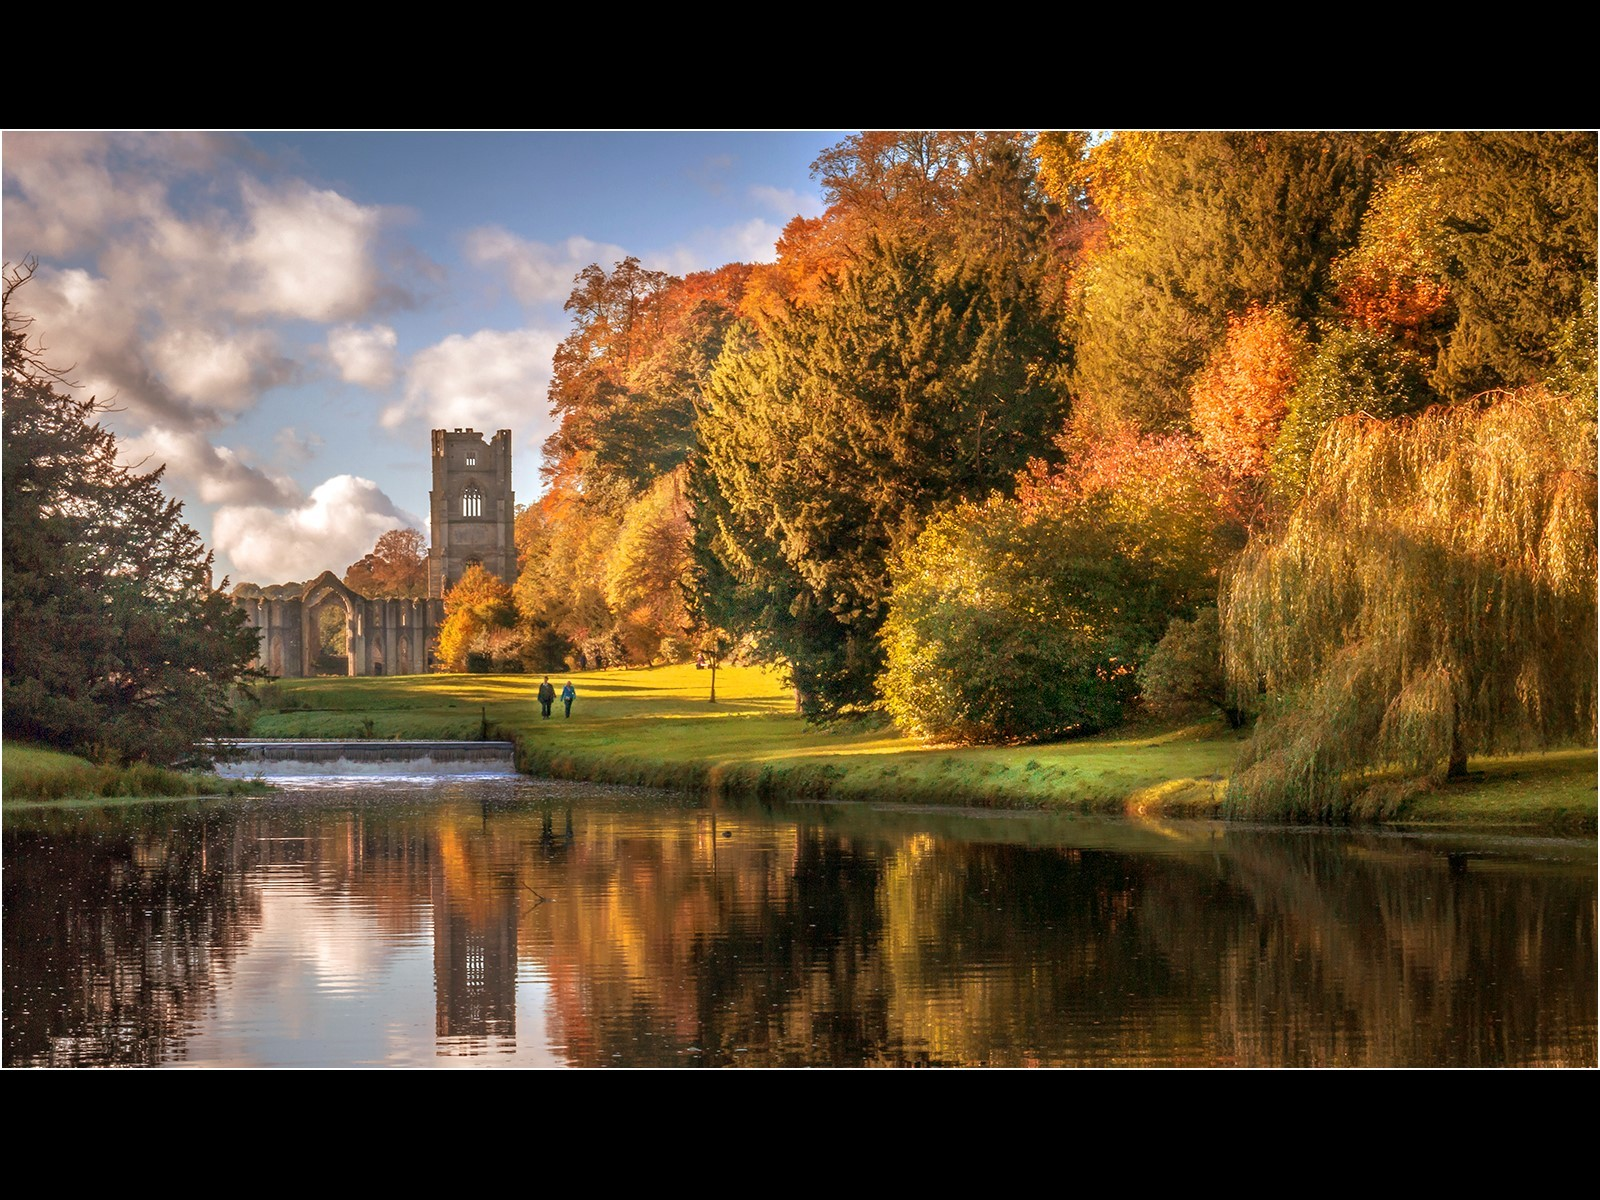 Morning Stroll Fountains Abbey